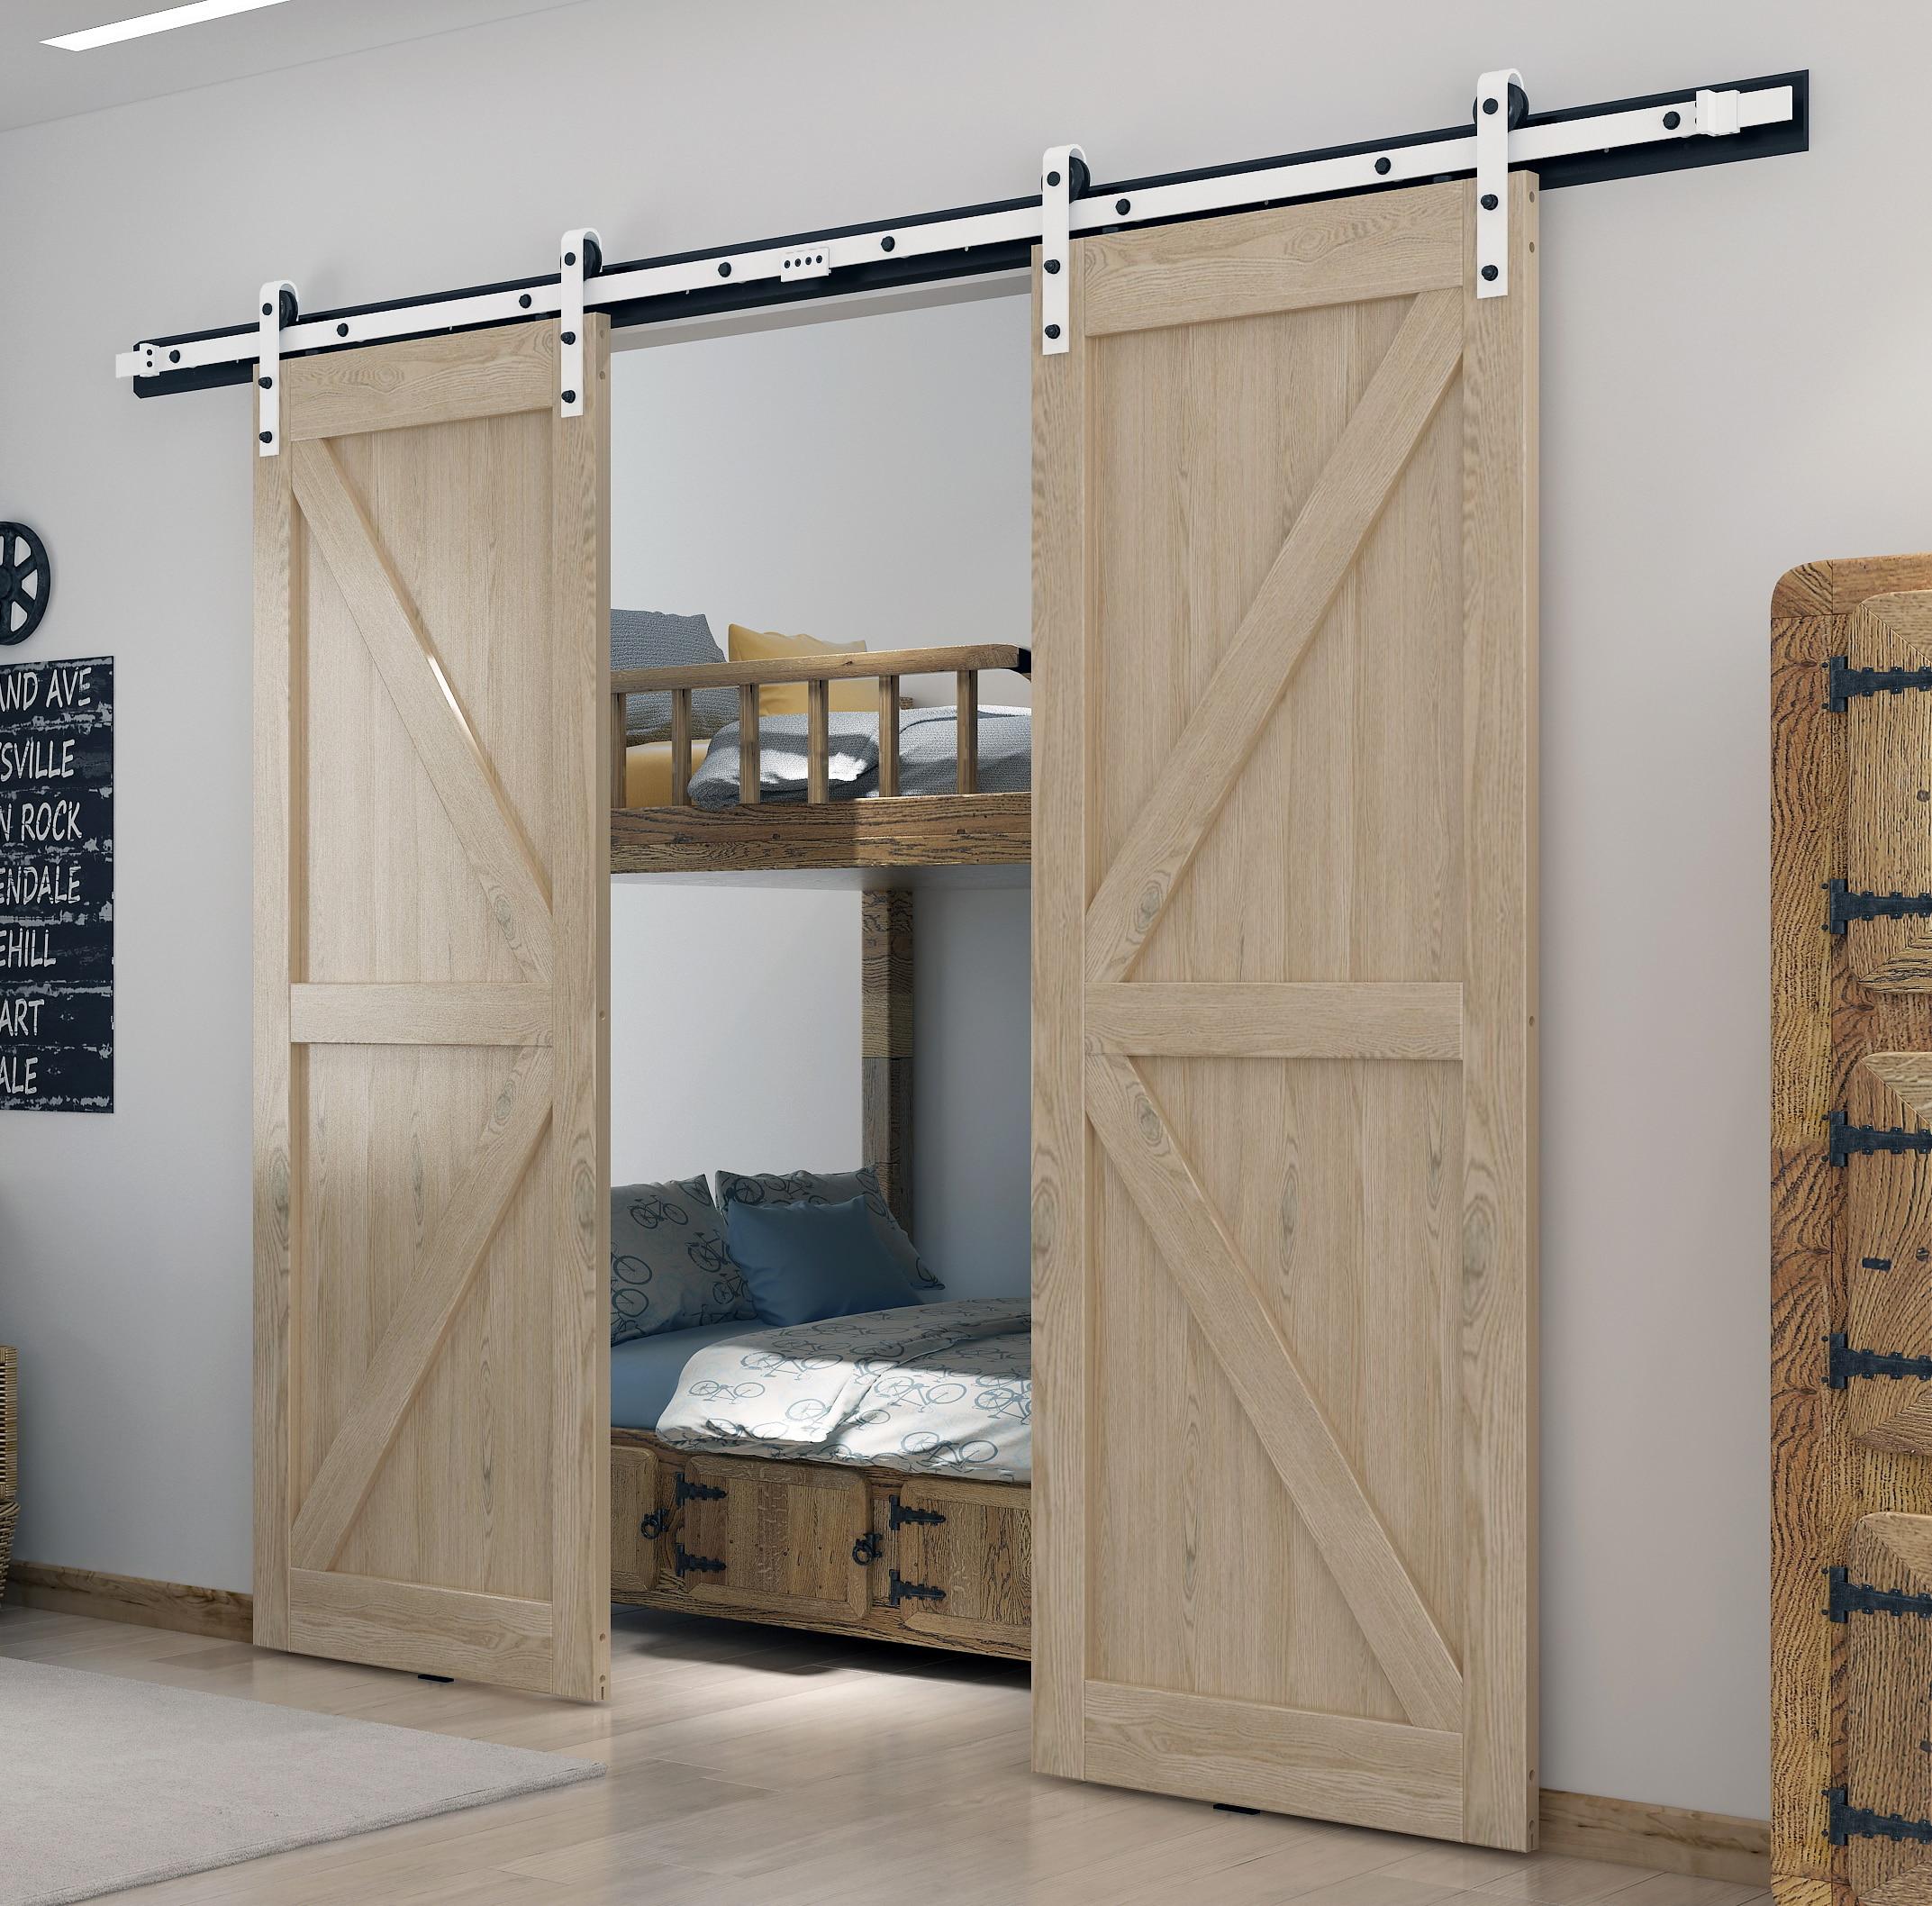 DIYHD White Coated Double Sliding Barn Door Hardware Heavy Duty Interior Wood Door Sliding Track